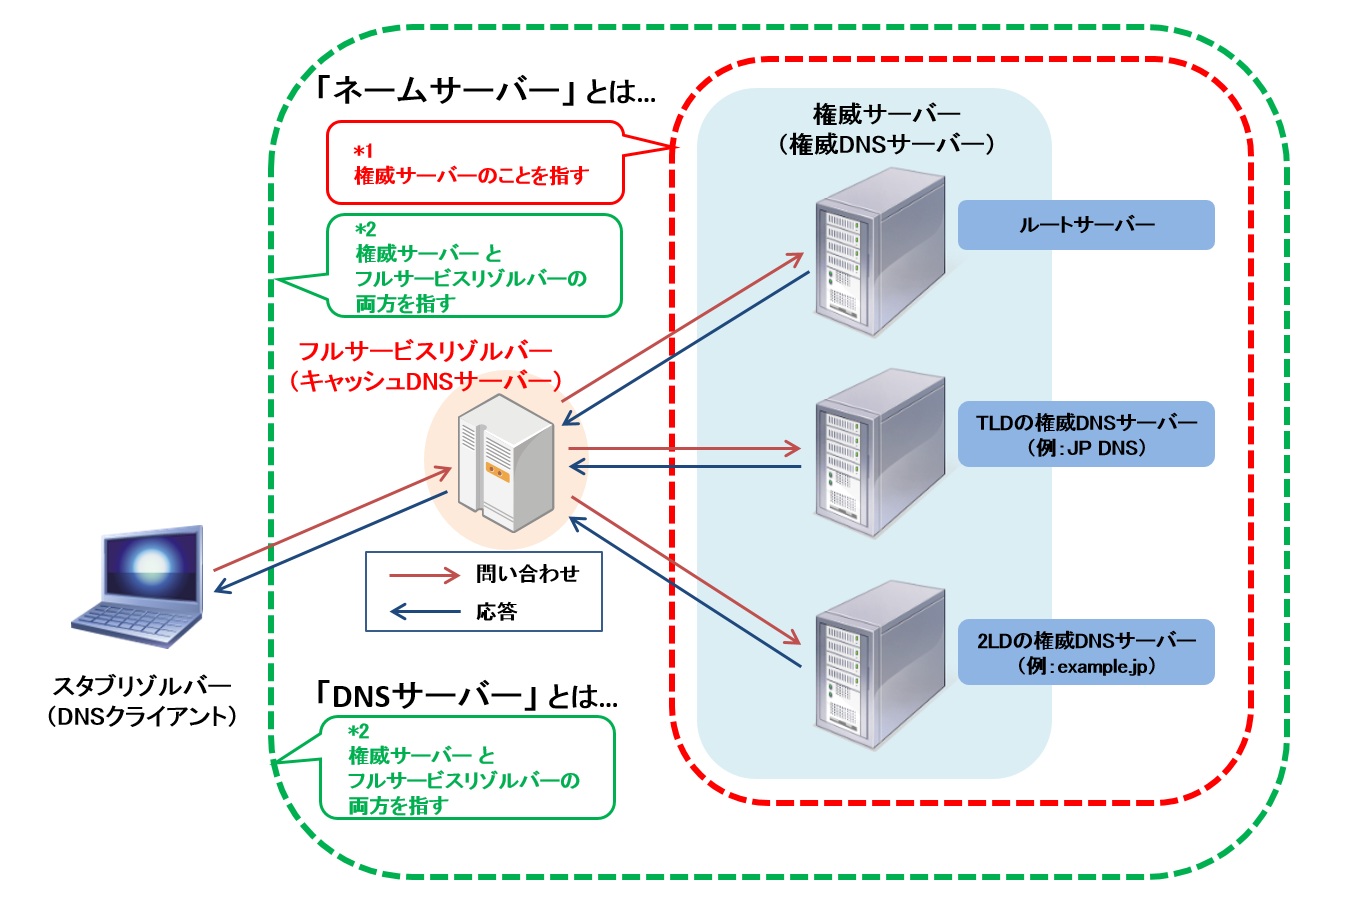 f:id:atsuhiro-me:20210302194038p:plain